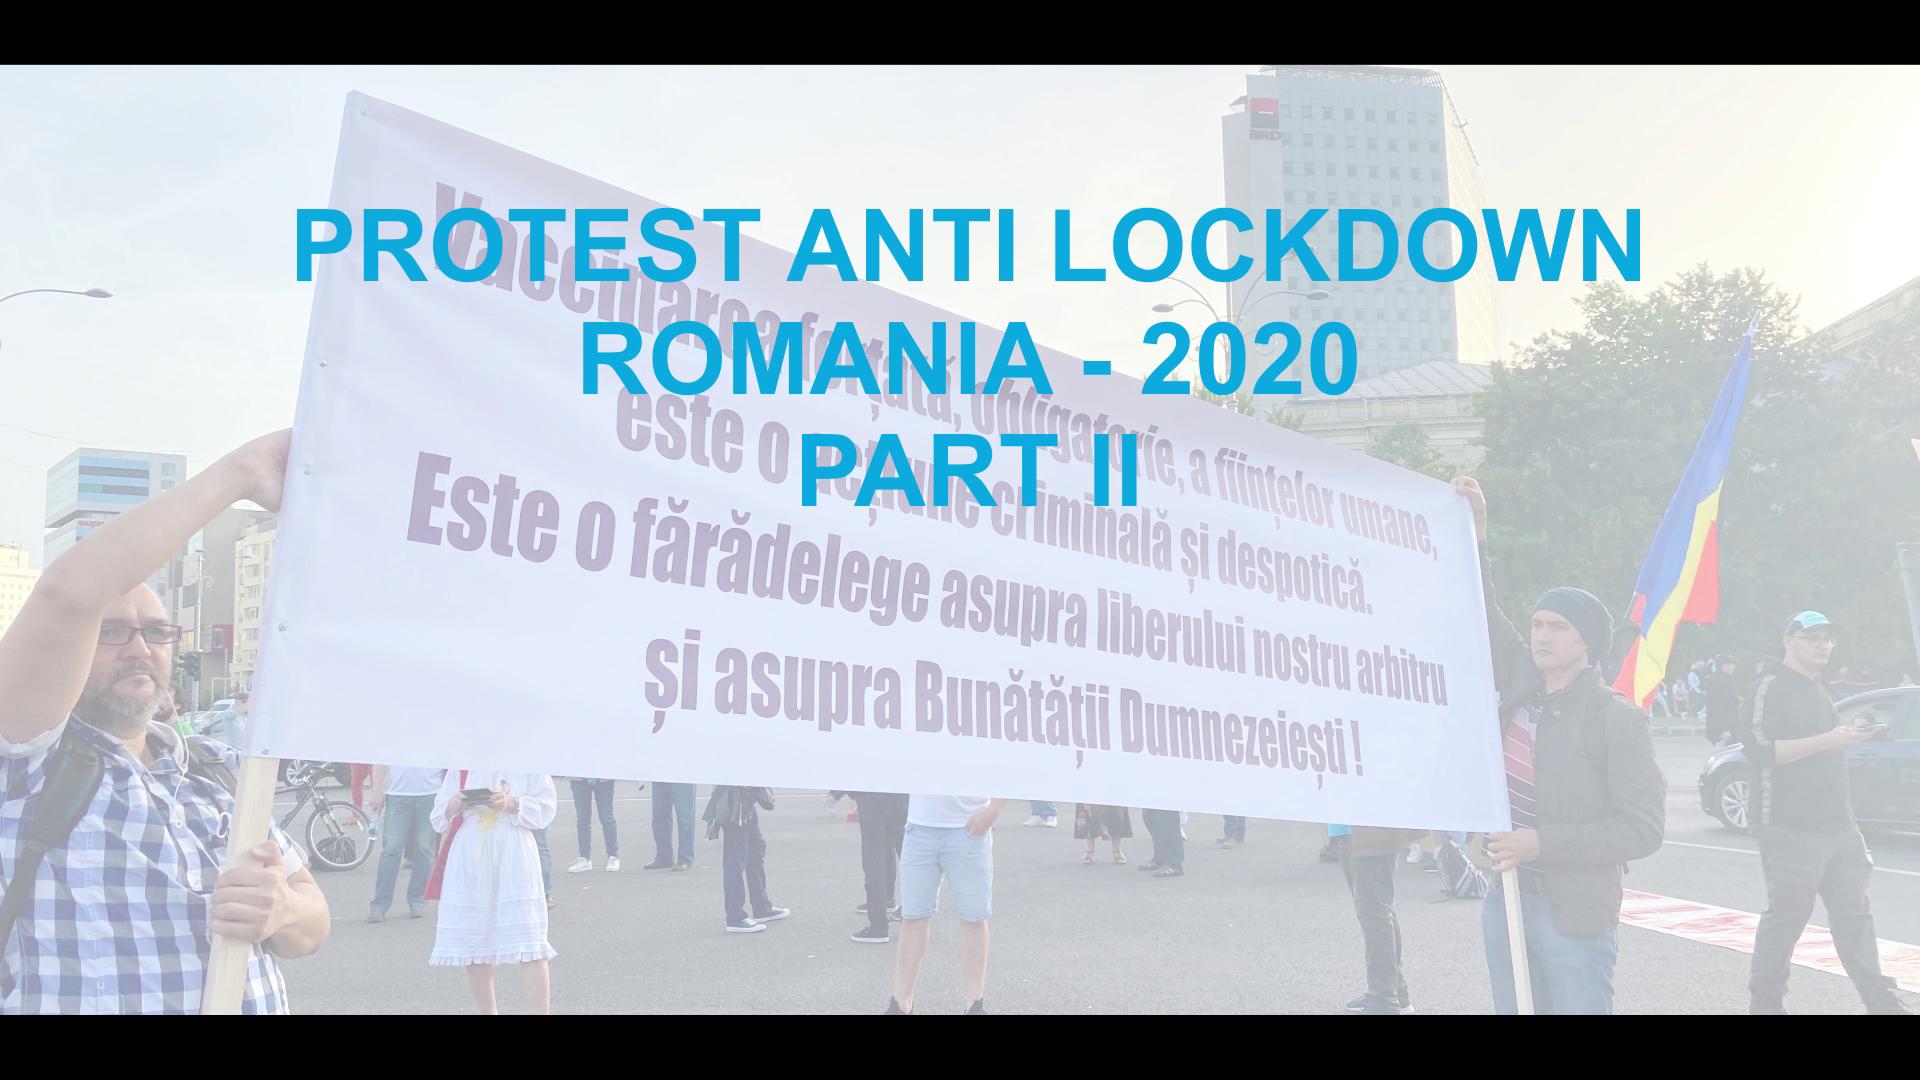 PROTESTE ANTI LOCKDOWN – ROMANIA 2020 (PART II)